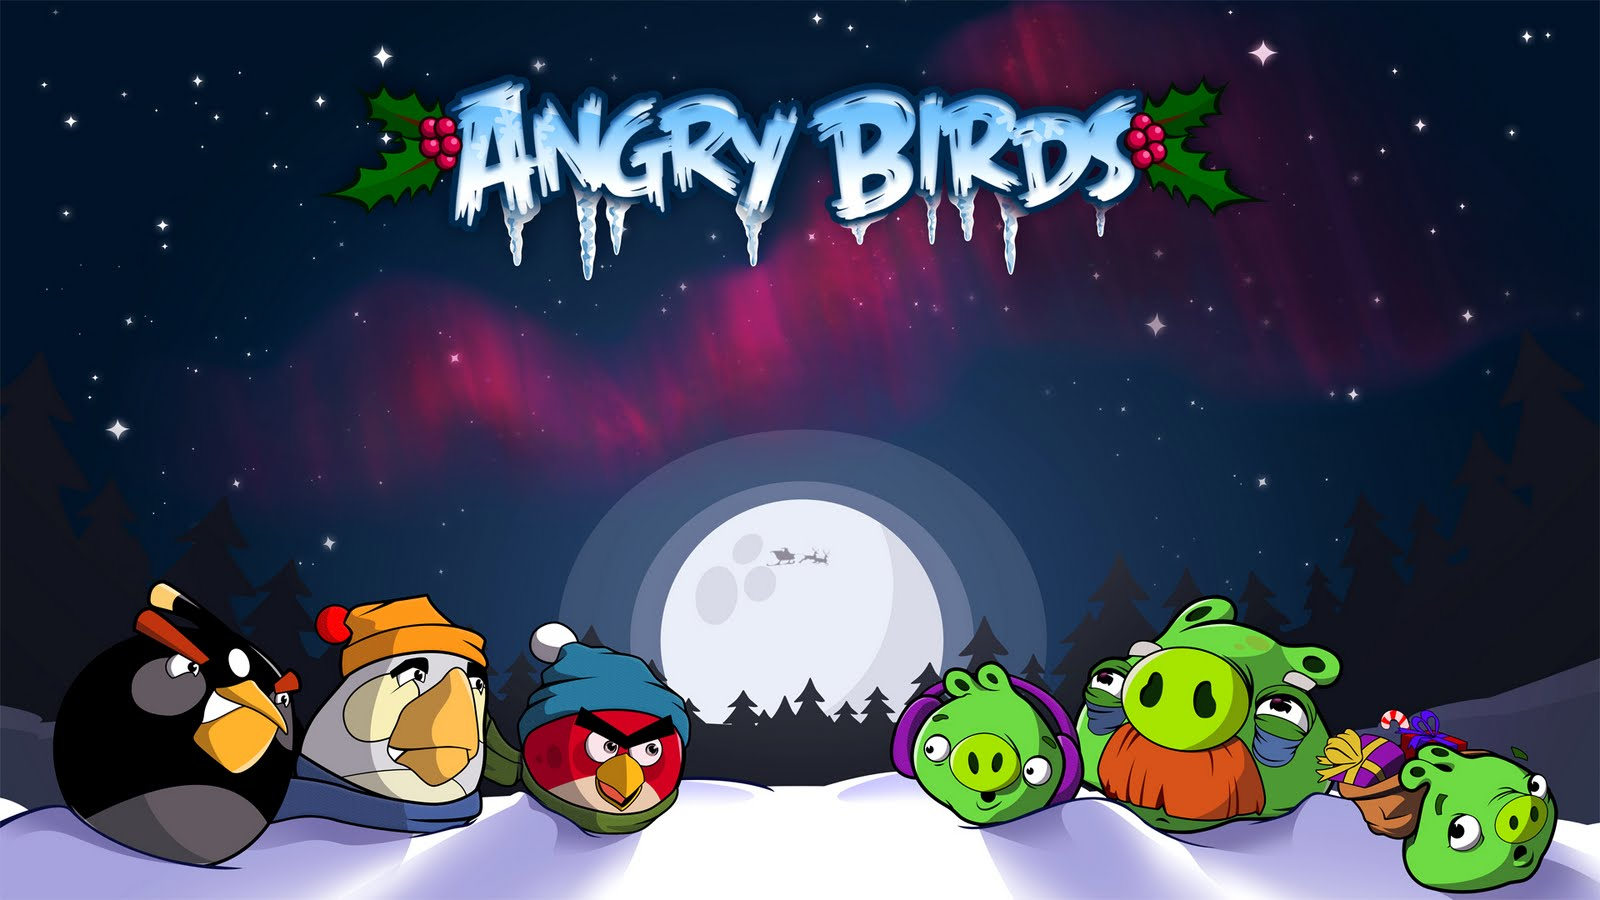 Desktop Wallpapers: Angry Birds Game HD Wallpapers